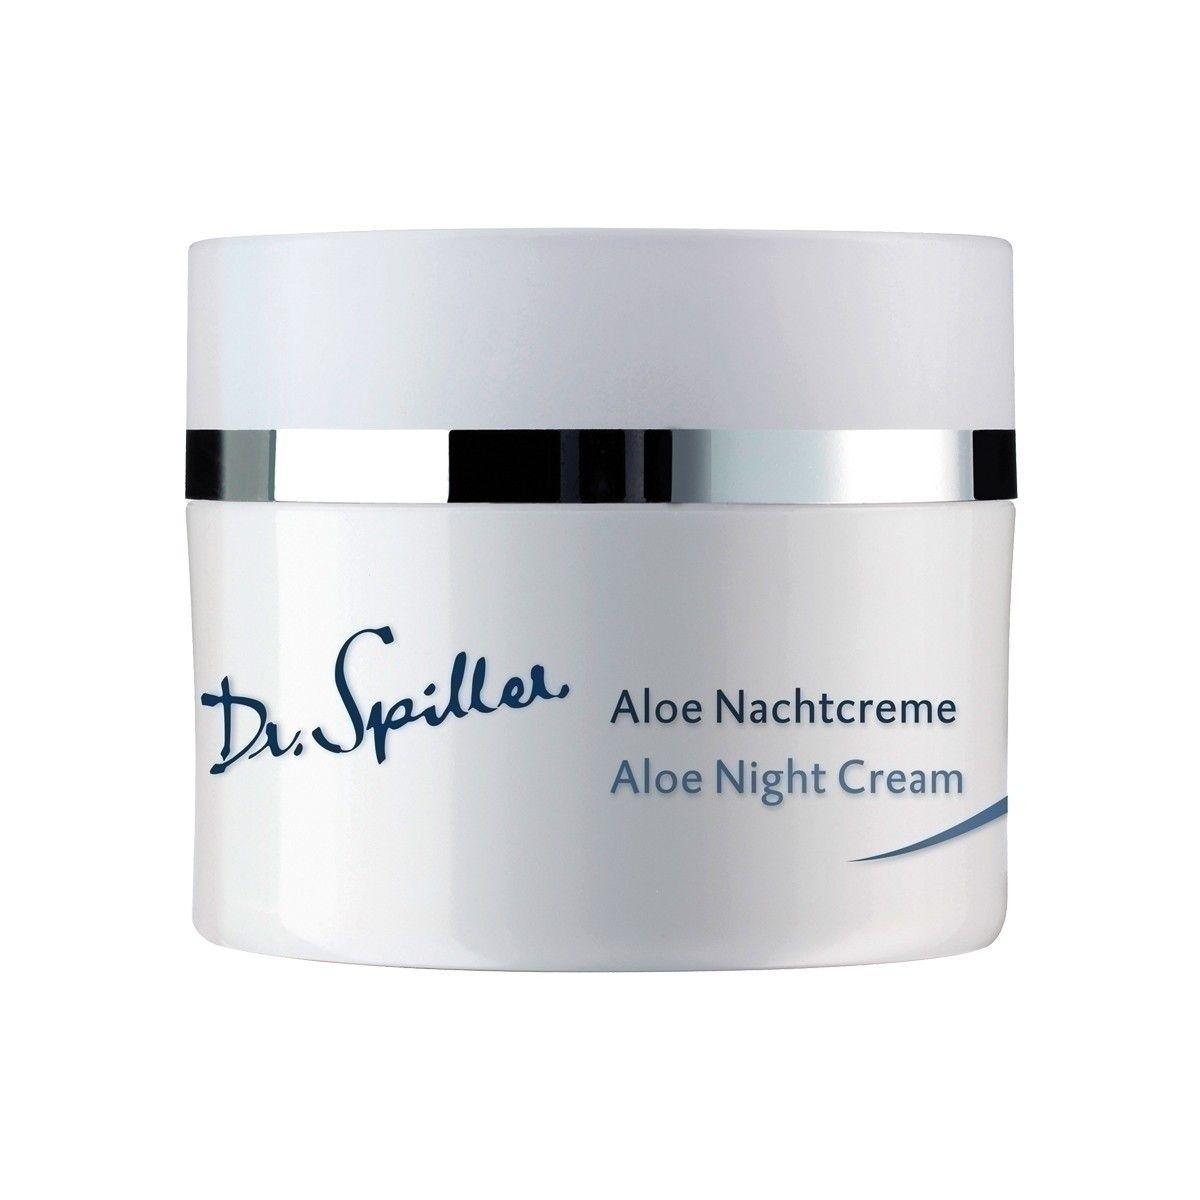 Afbeelding van Dr. Spiller Aloe Nachtcreme Base Line Basisverzorging jonge huid